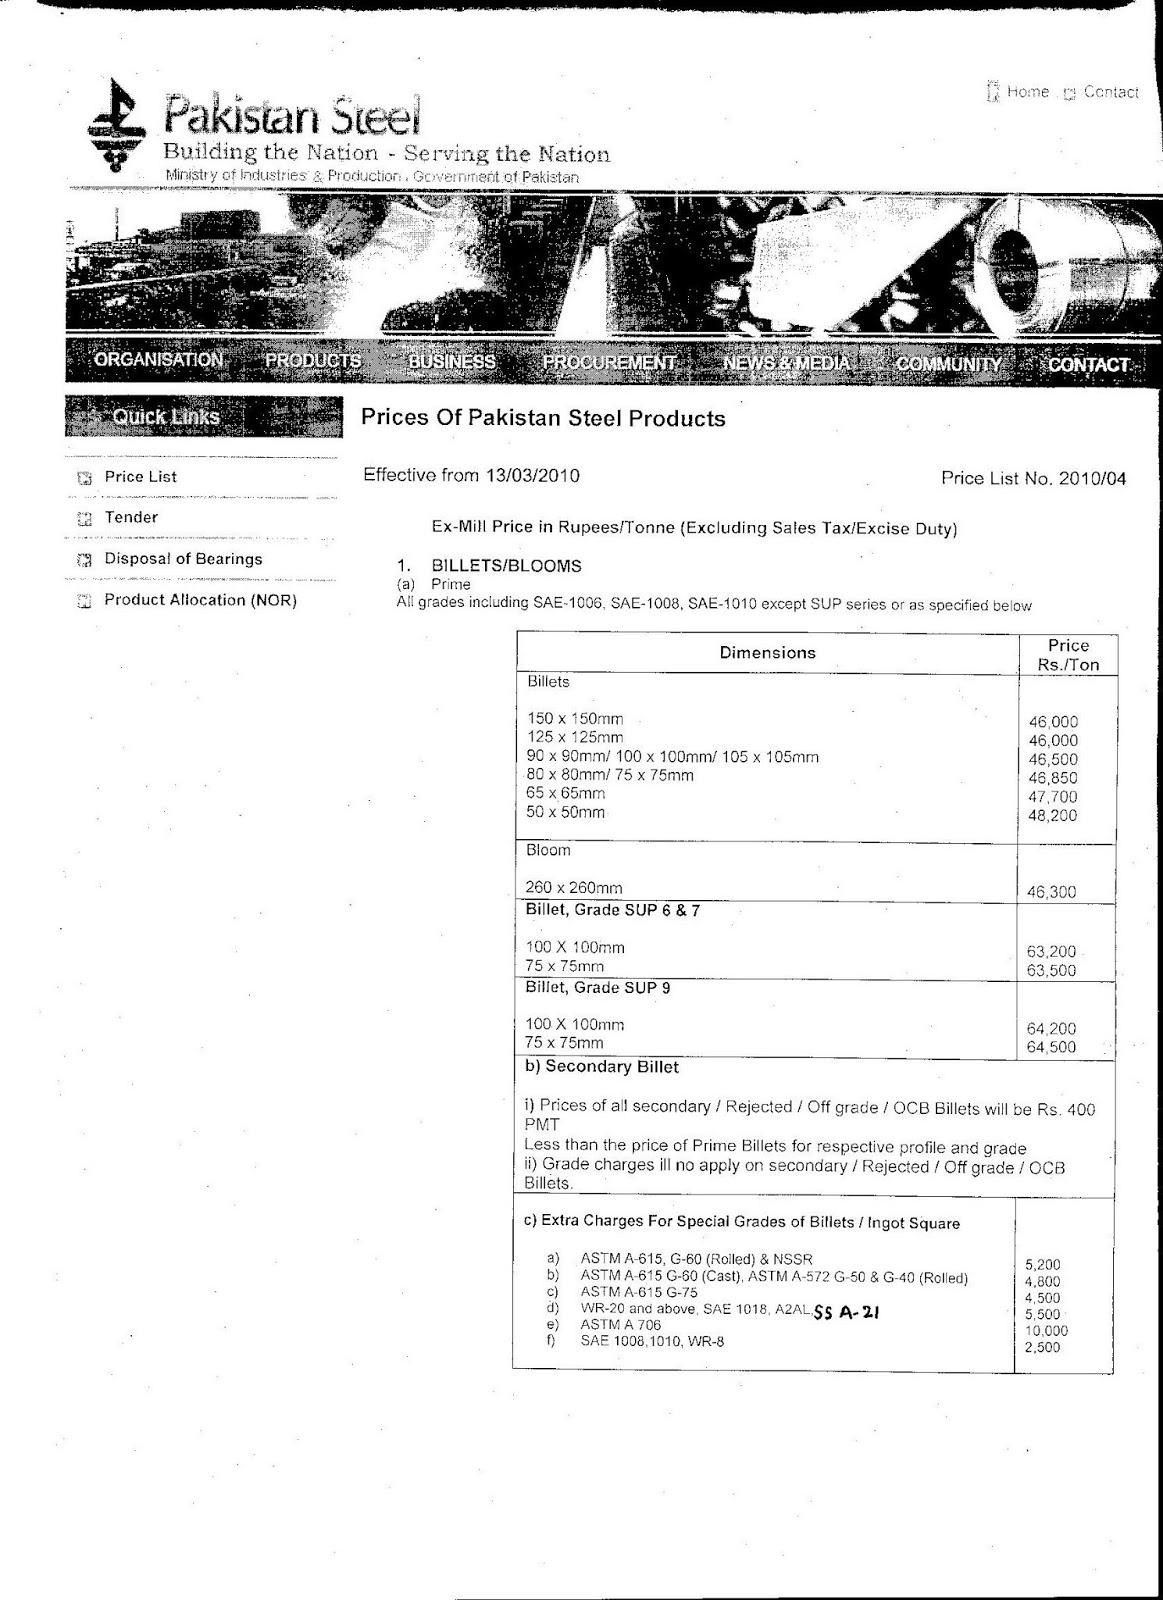 Raja Farrukh's Blog: Pakistan Steel Billet Rate 2010